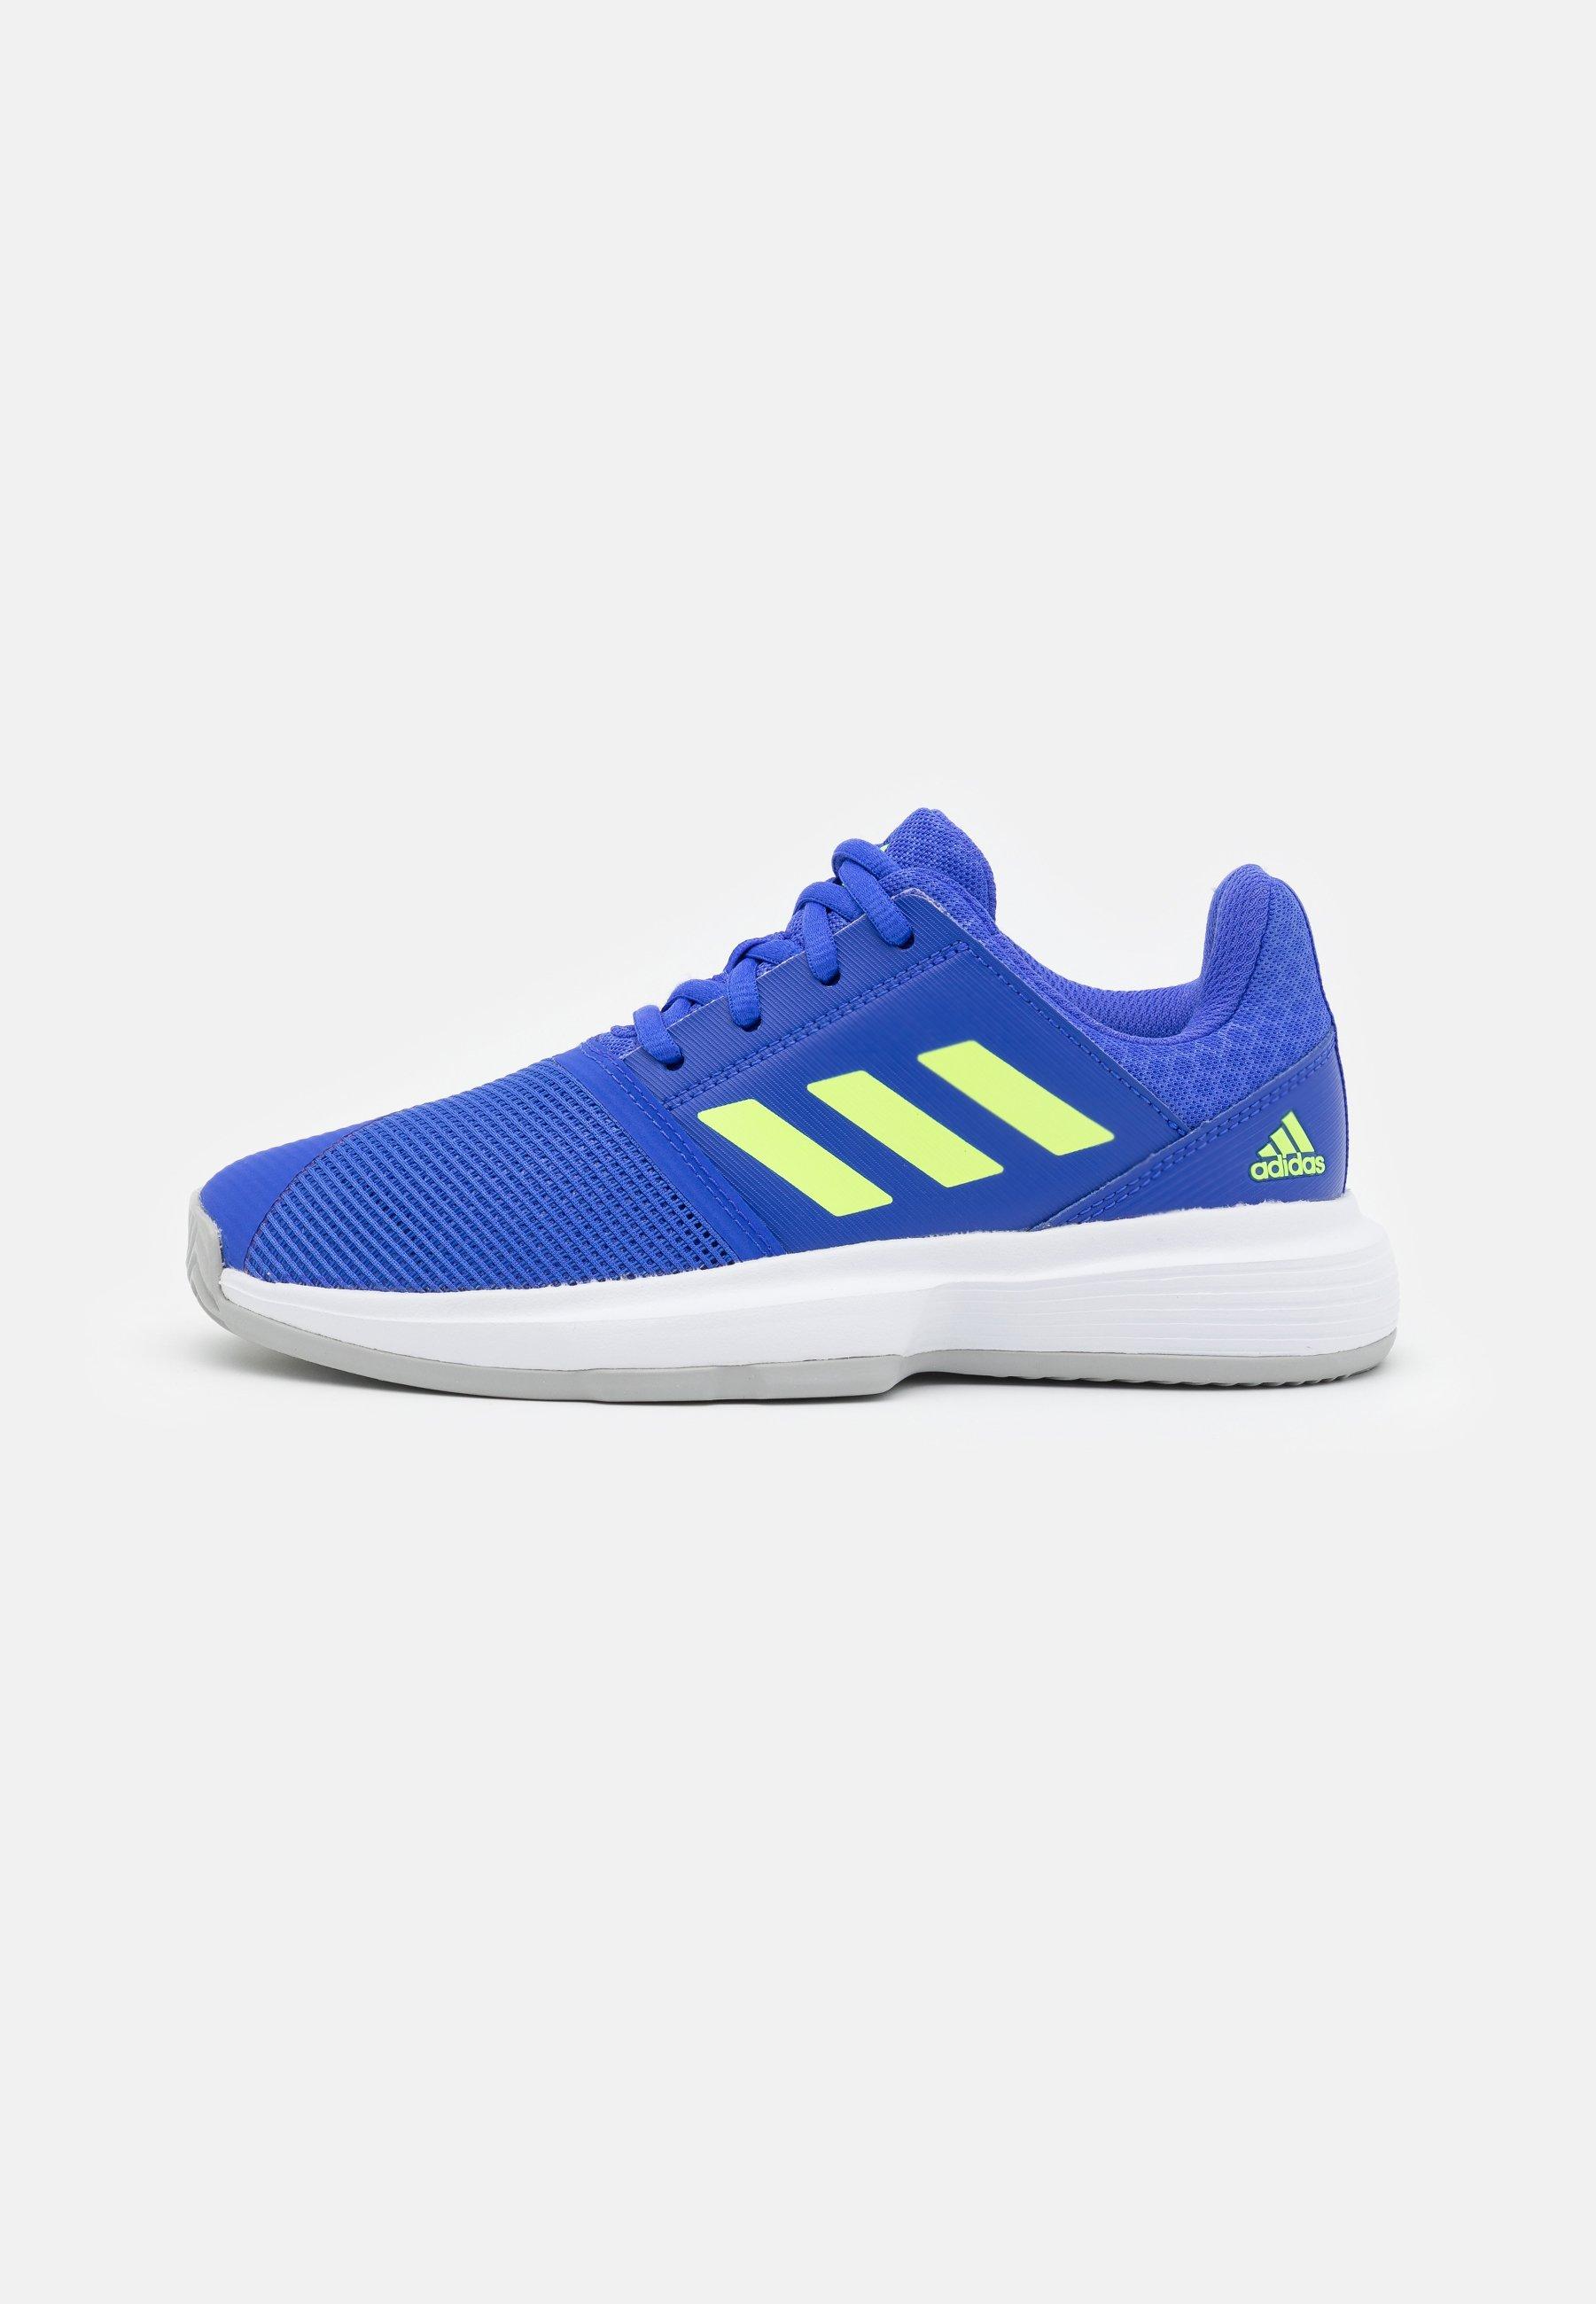 Kids COURTJAM XJ UNISEX - Multicourt tennis shoes